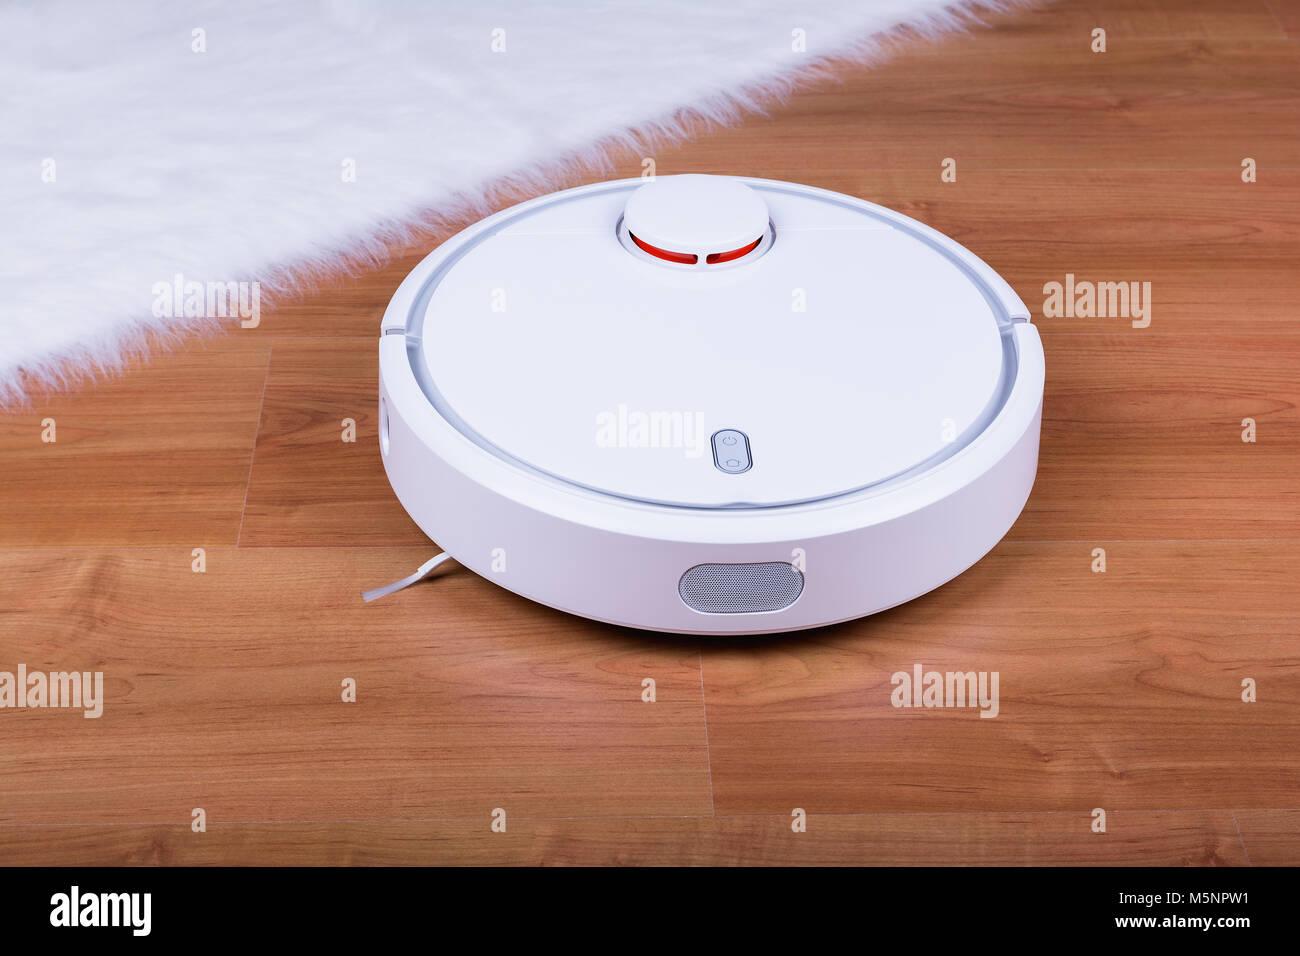 Fußboden Roboter ~ Staubsauger roboter auf laminat fussboden stockfoto bild